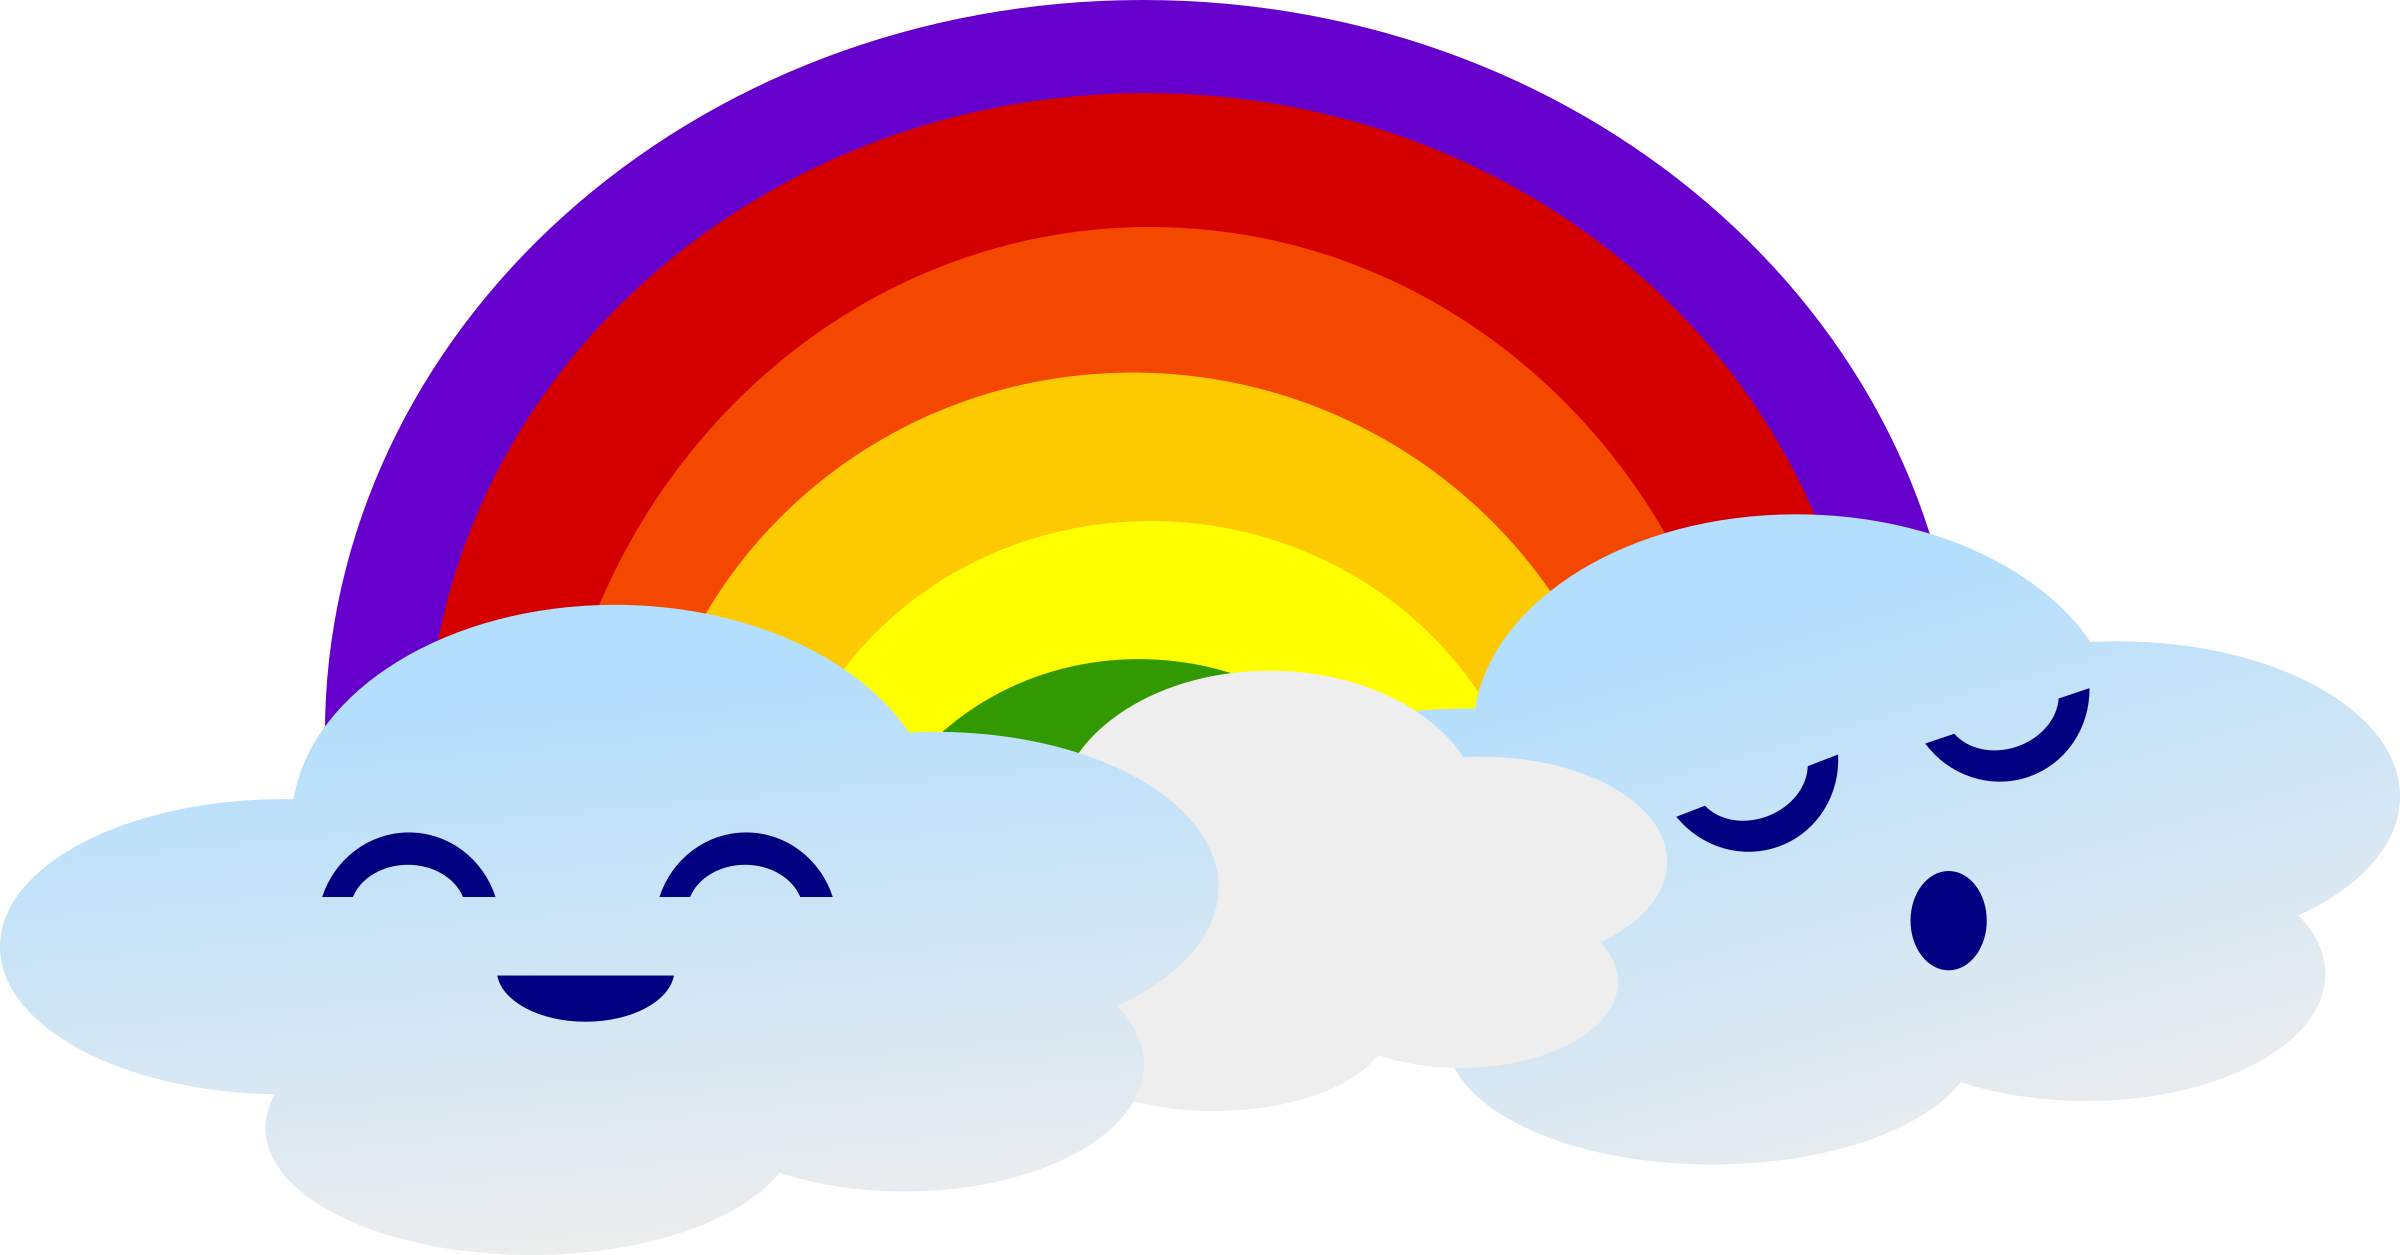 Kawaii star clipart clip royalty free download Kawaii Rainbow Icons PNG - Free PNG and Icons Downloads clip royalty free download